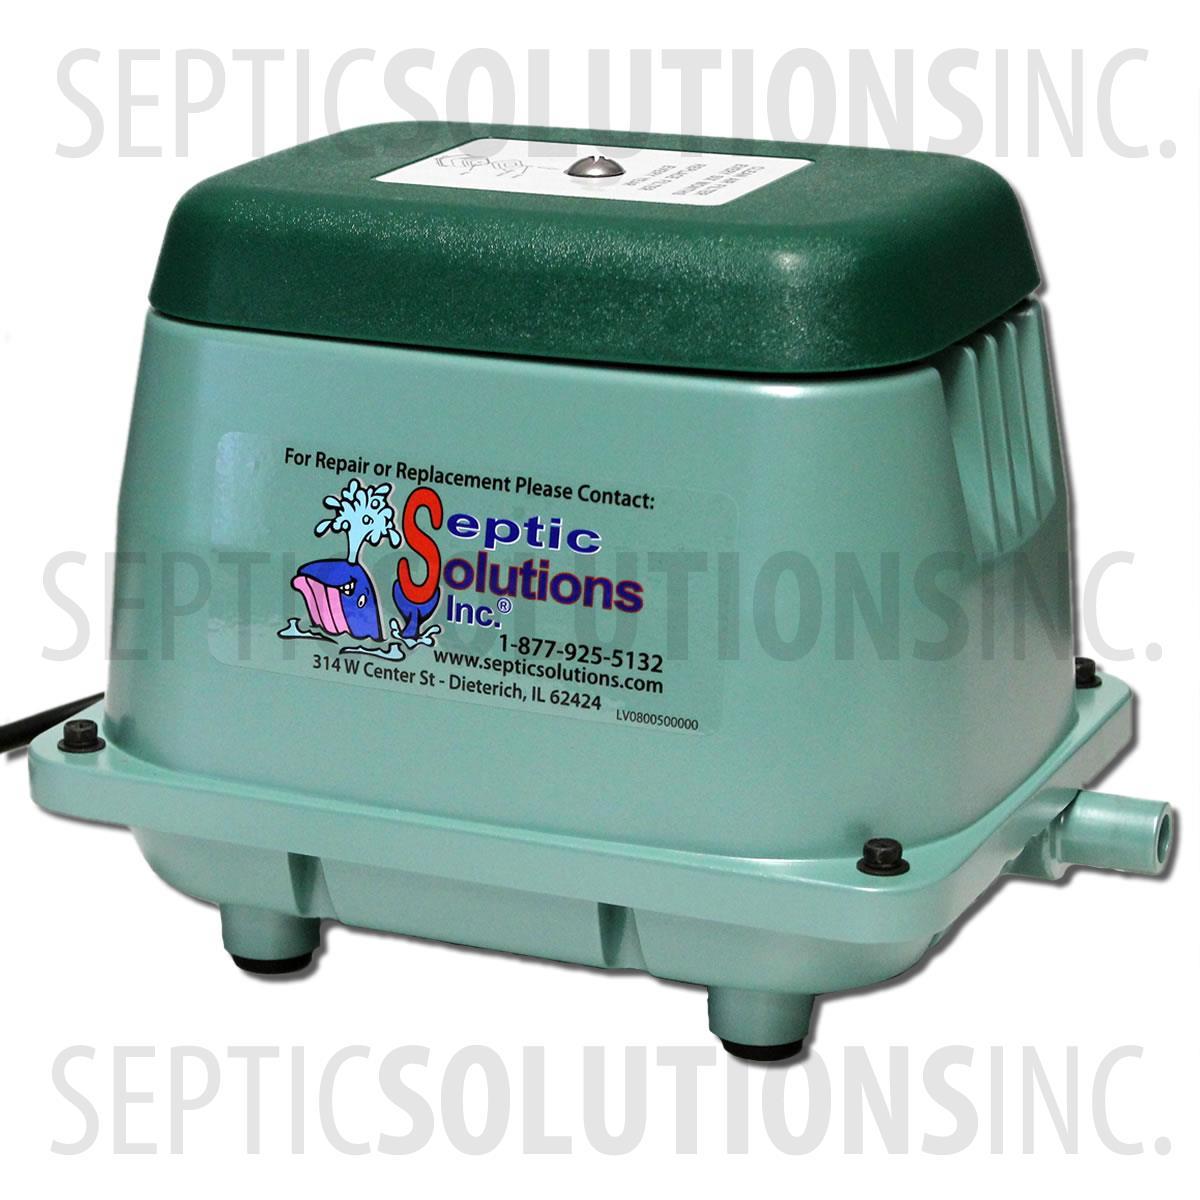 Nayadic M6a Replacement Septic Air Pump Linear Sepitc